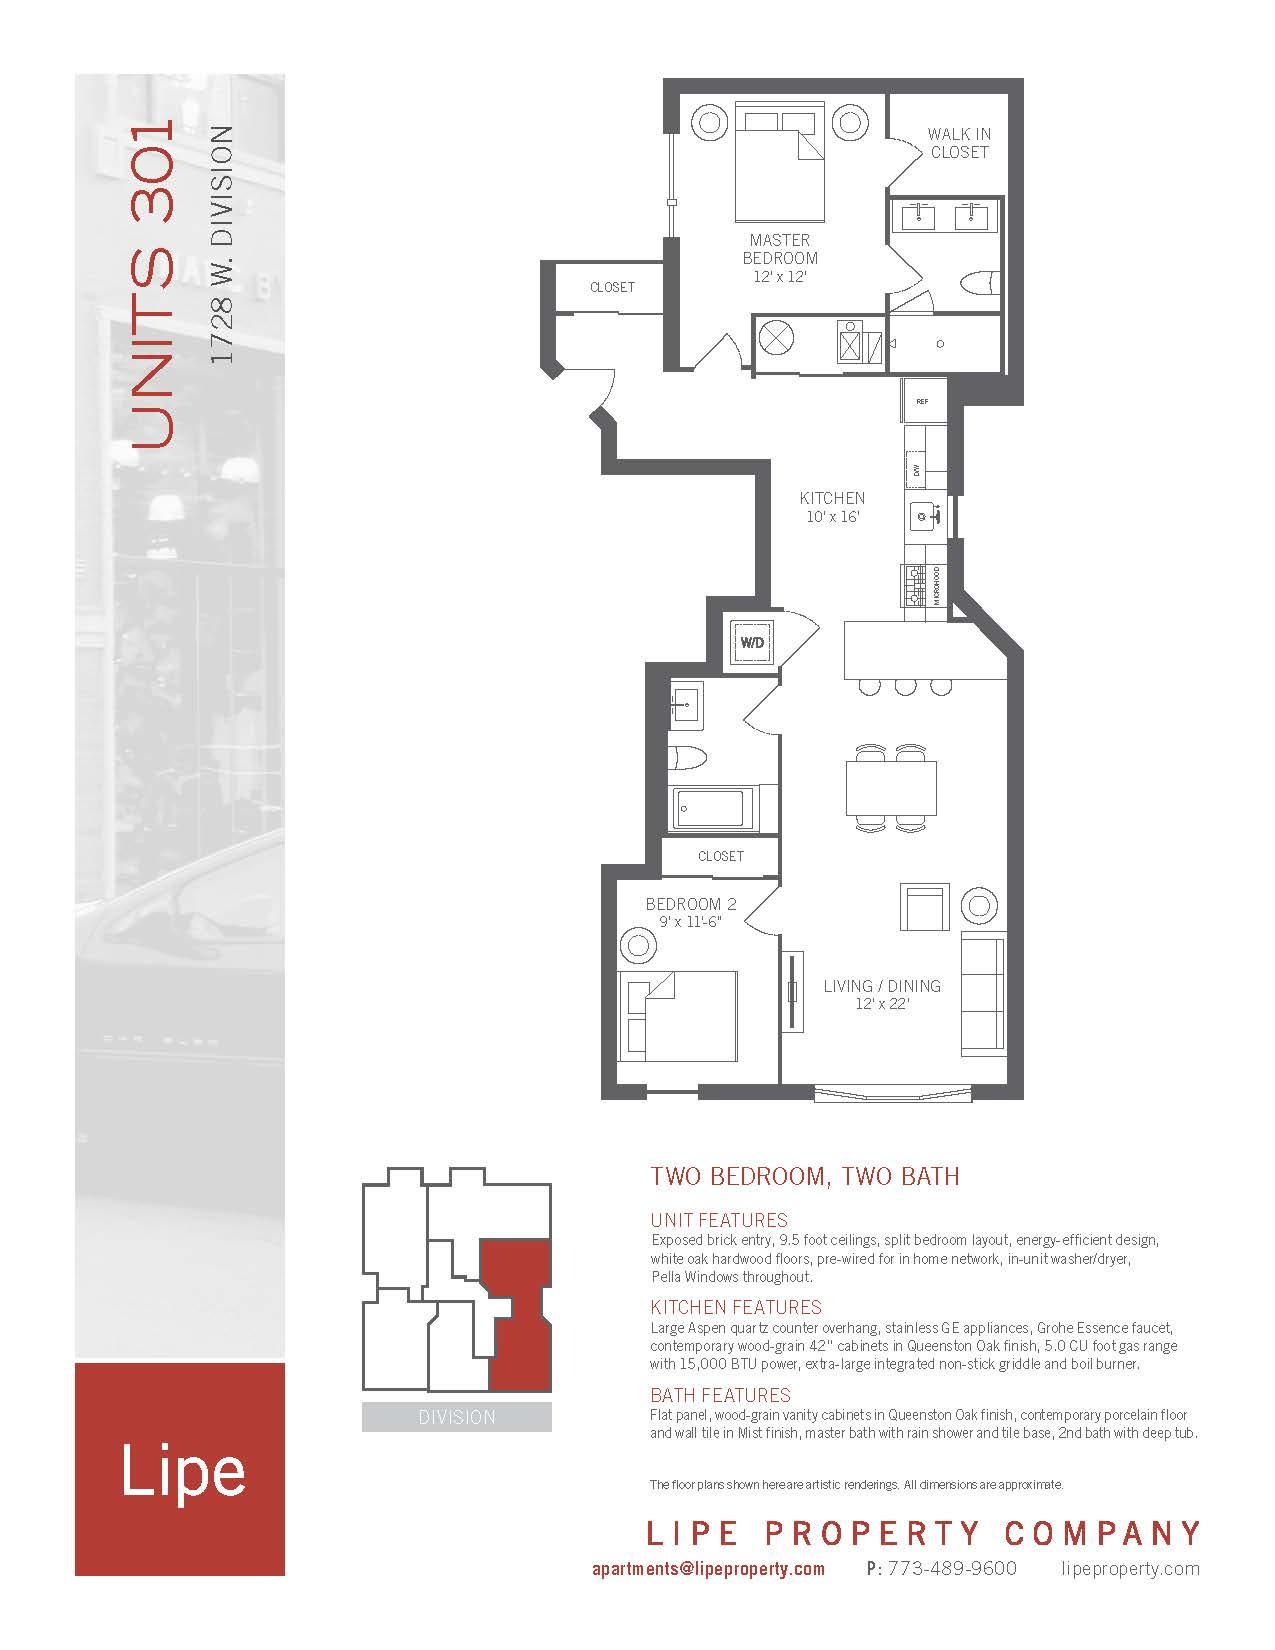 1728-West-Division-301-Floorplan-Chicago-apartment-for-rent.jpg